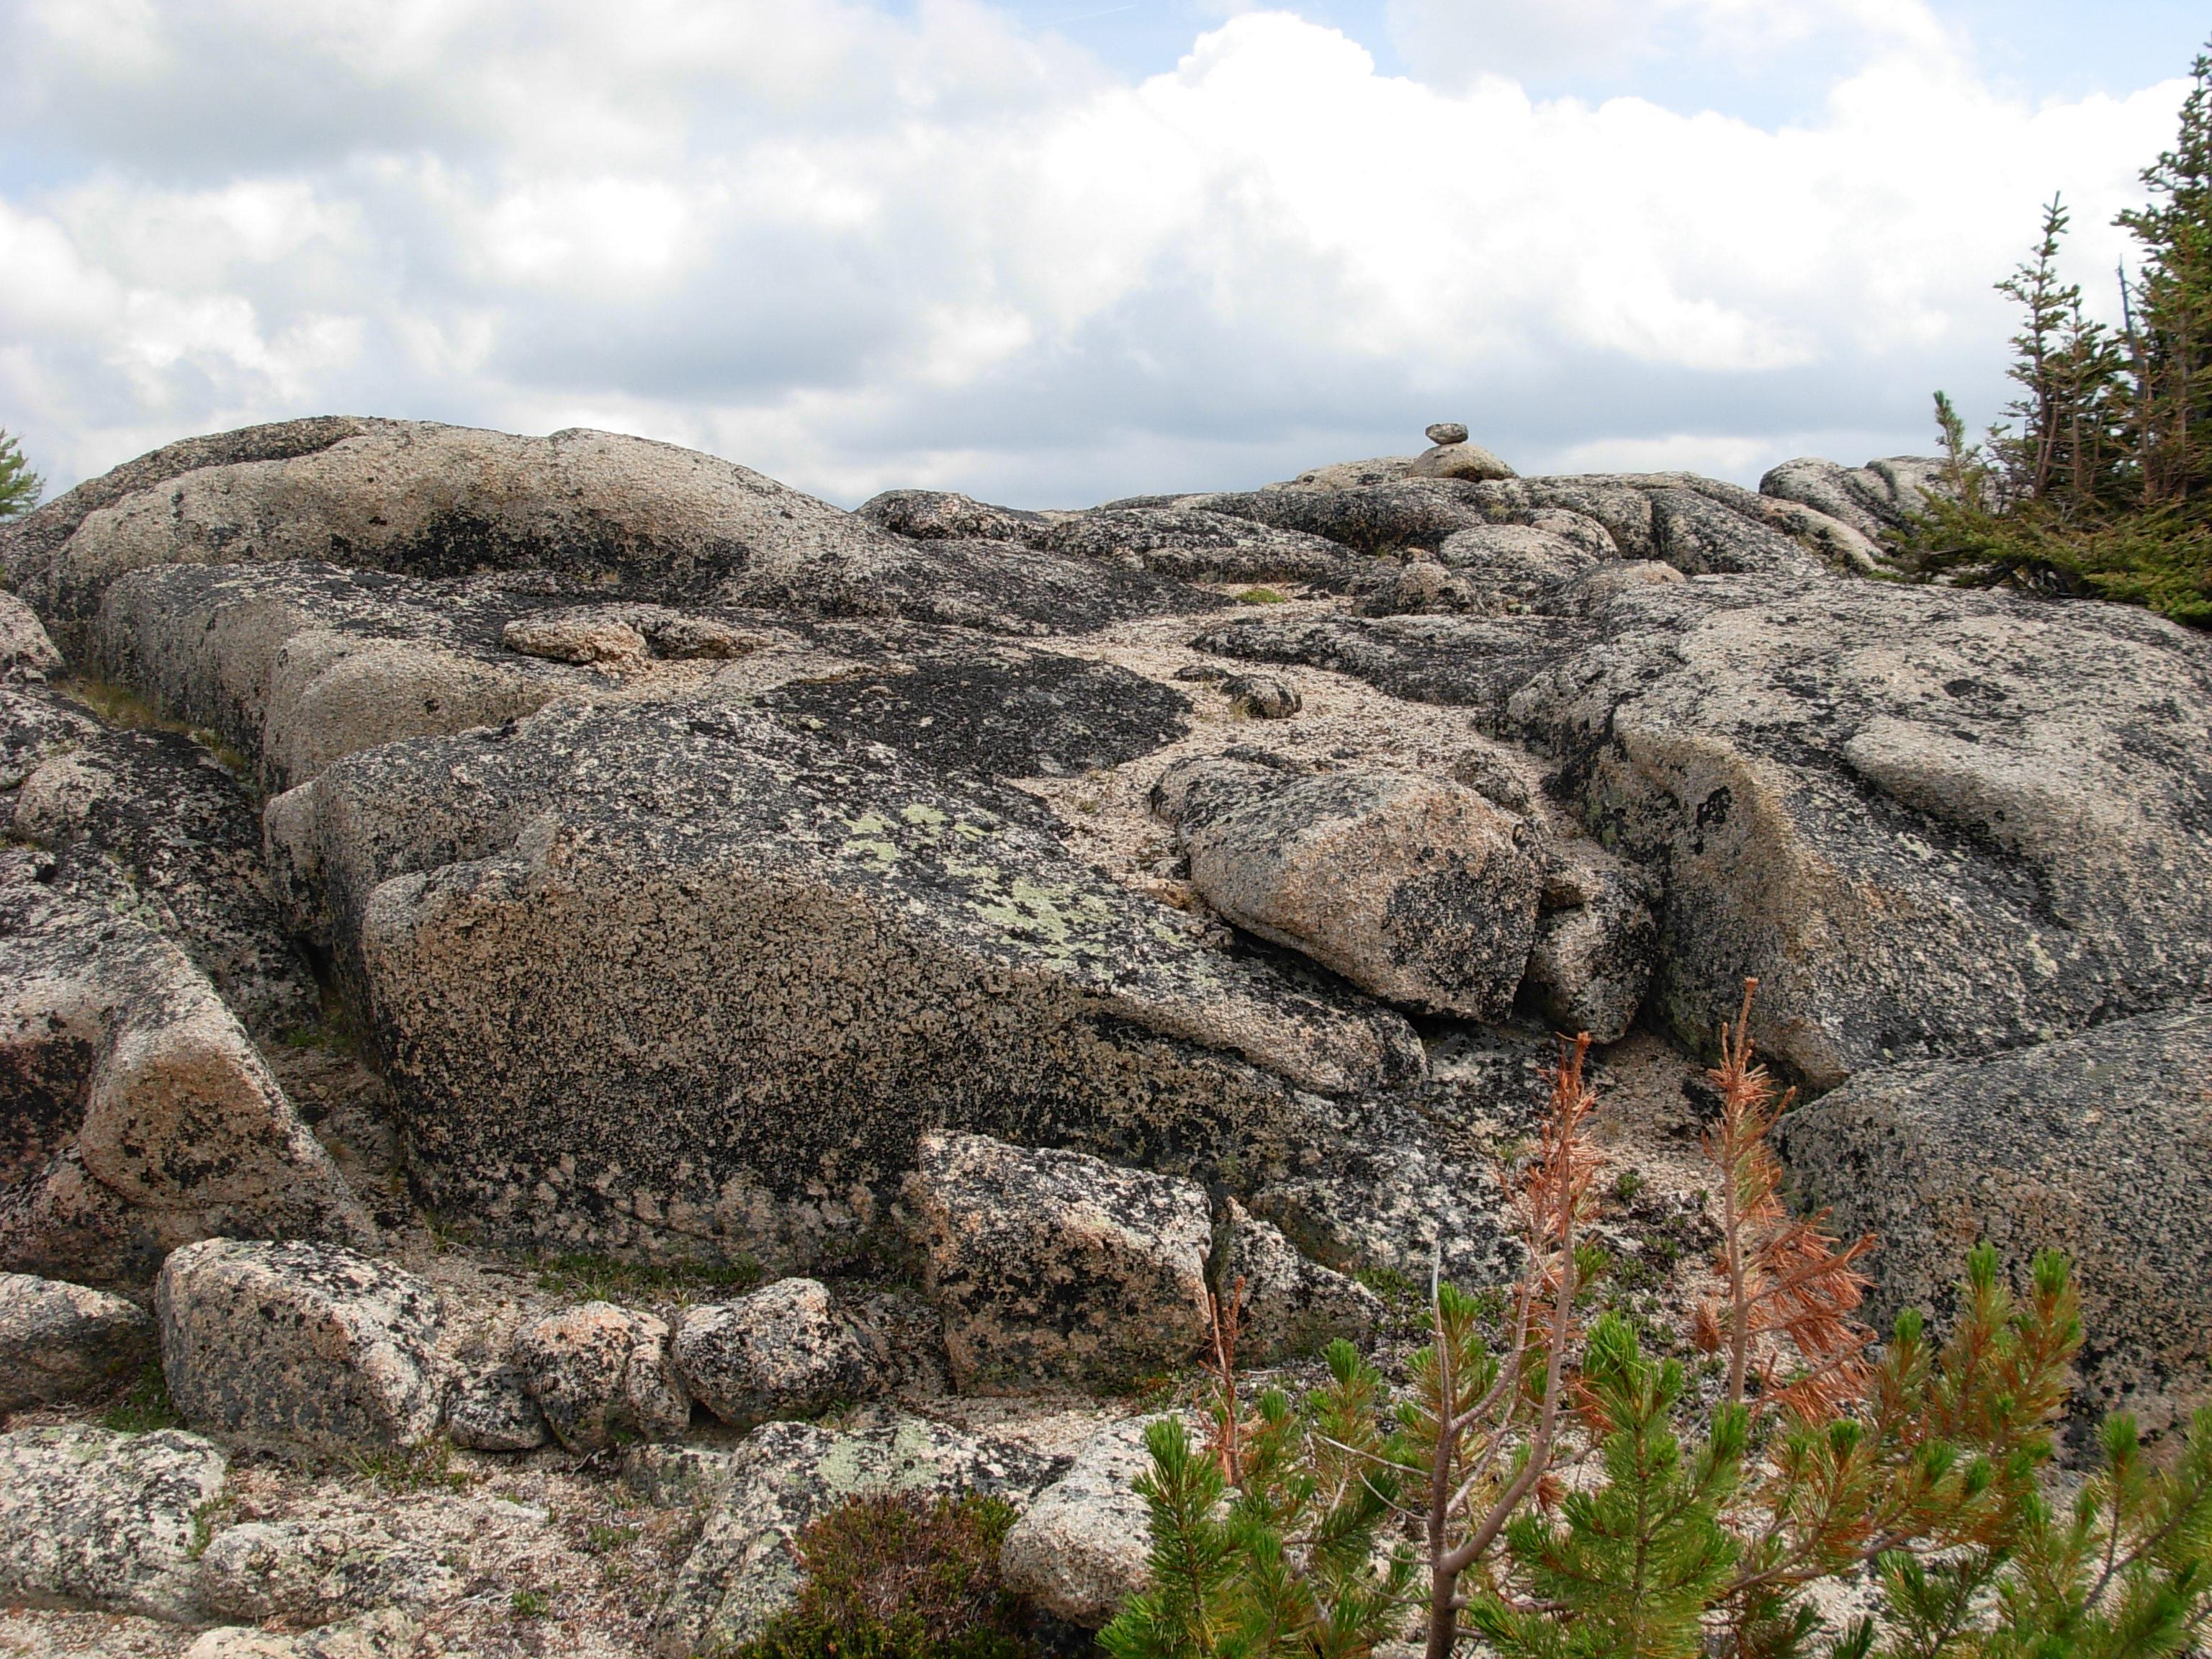 Teapot Dome : Climbing, Hiking & Mountaineering : SummitPost